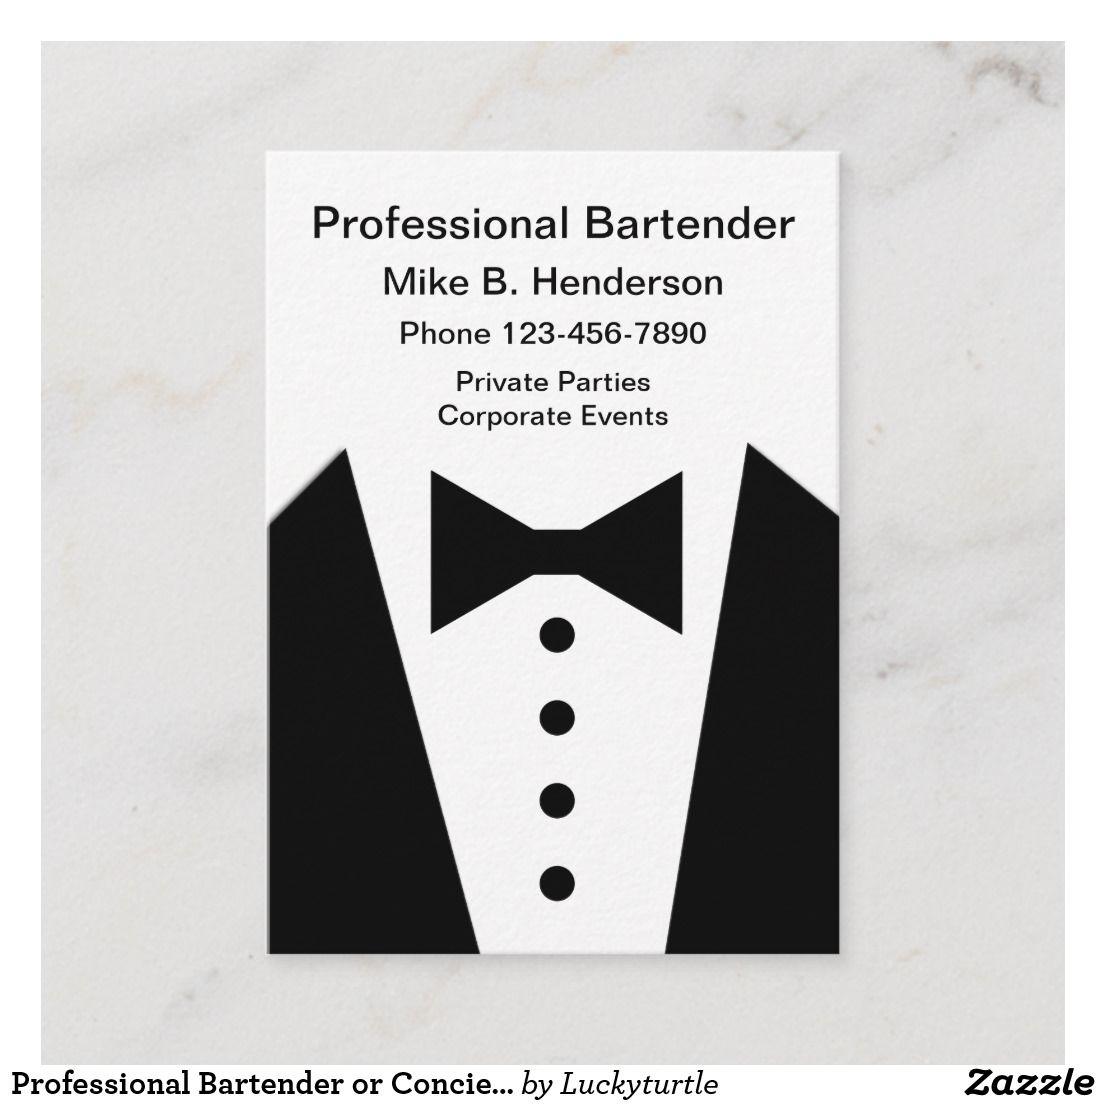 Professional Bartender or Concierge Business Card |  #businesscards #businesscardmaker #businesscarddesign #businesscardtemplate